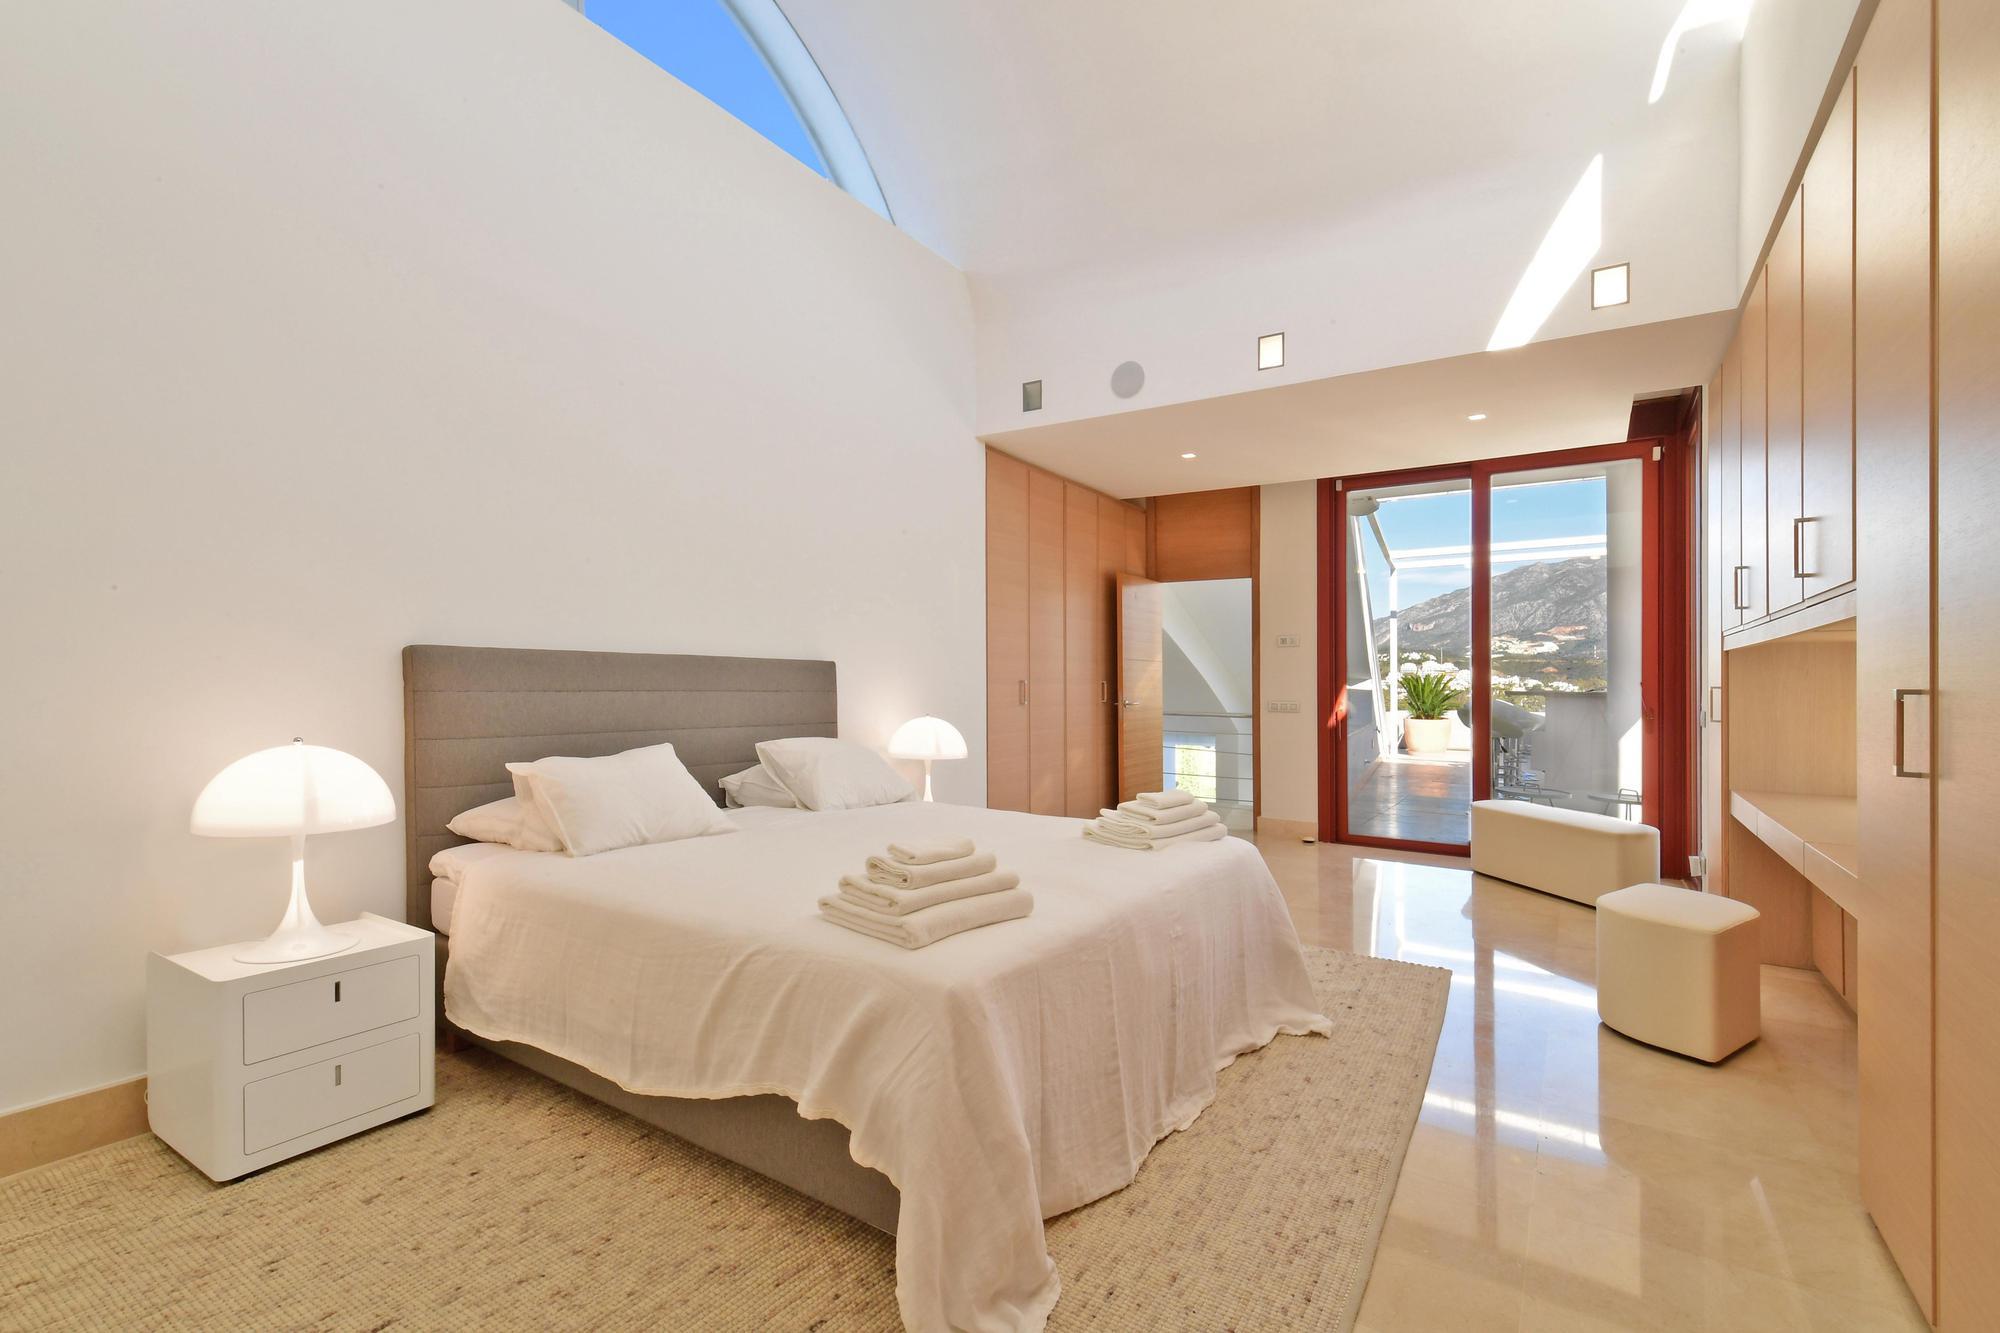 Willa do wynajęcia, 7 sypialni, Marbella